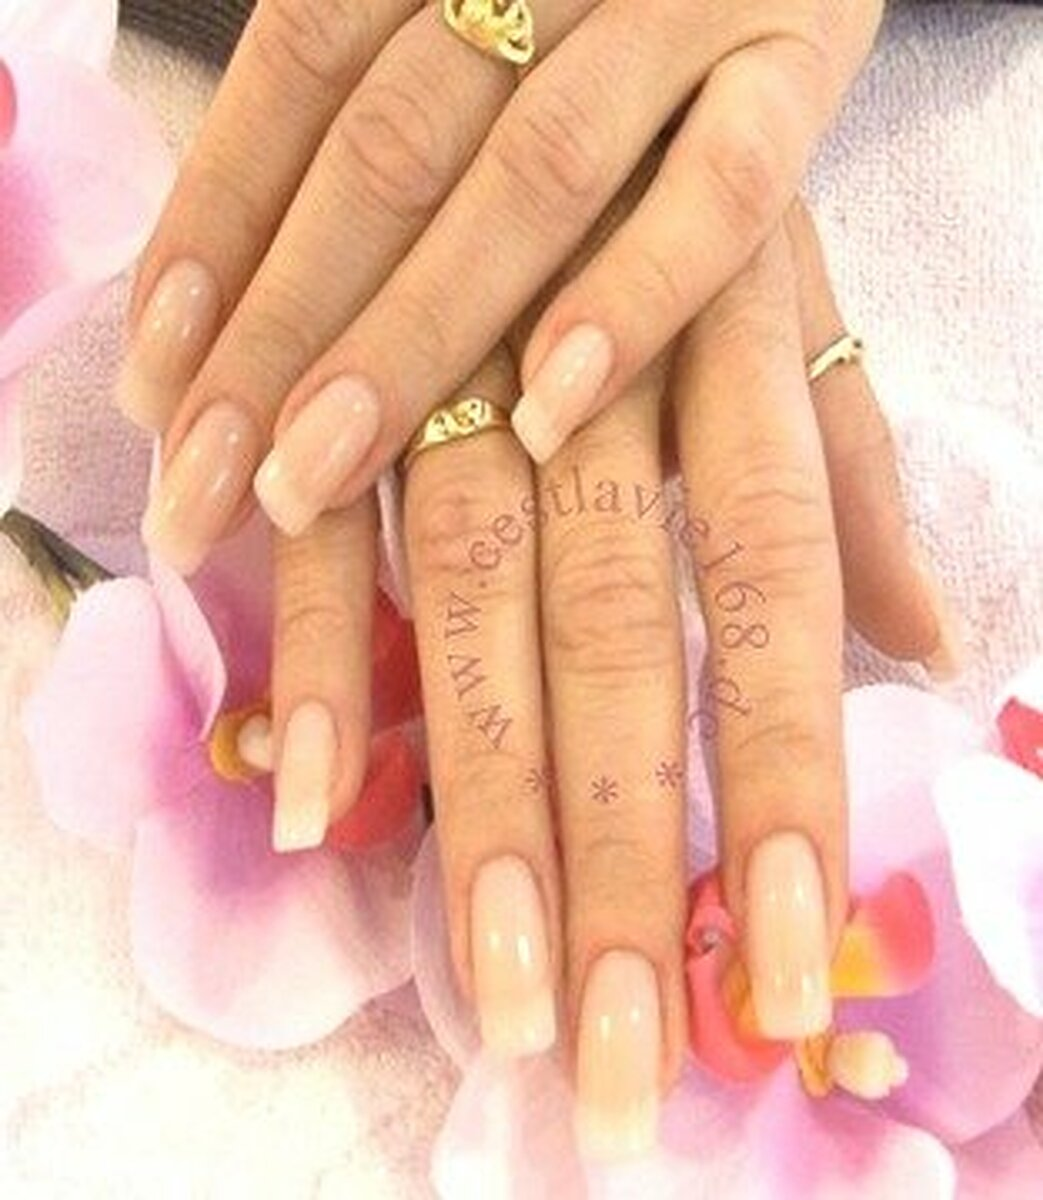 C 39 est la vie nails beauty salon leopoldstr schwabing for 24 hour nail salon in atlanta ga